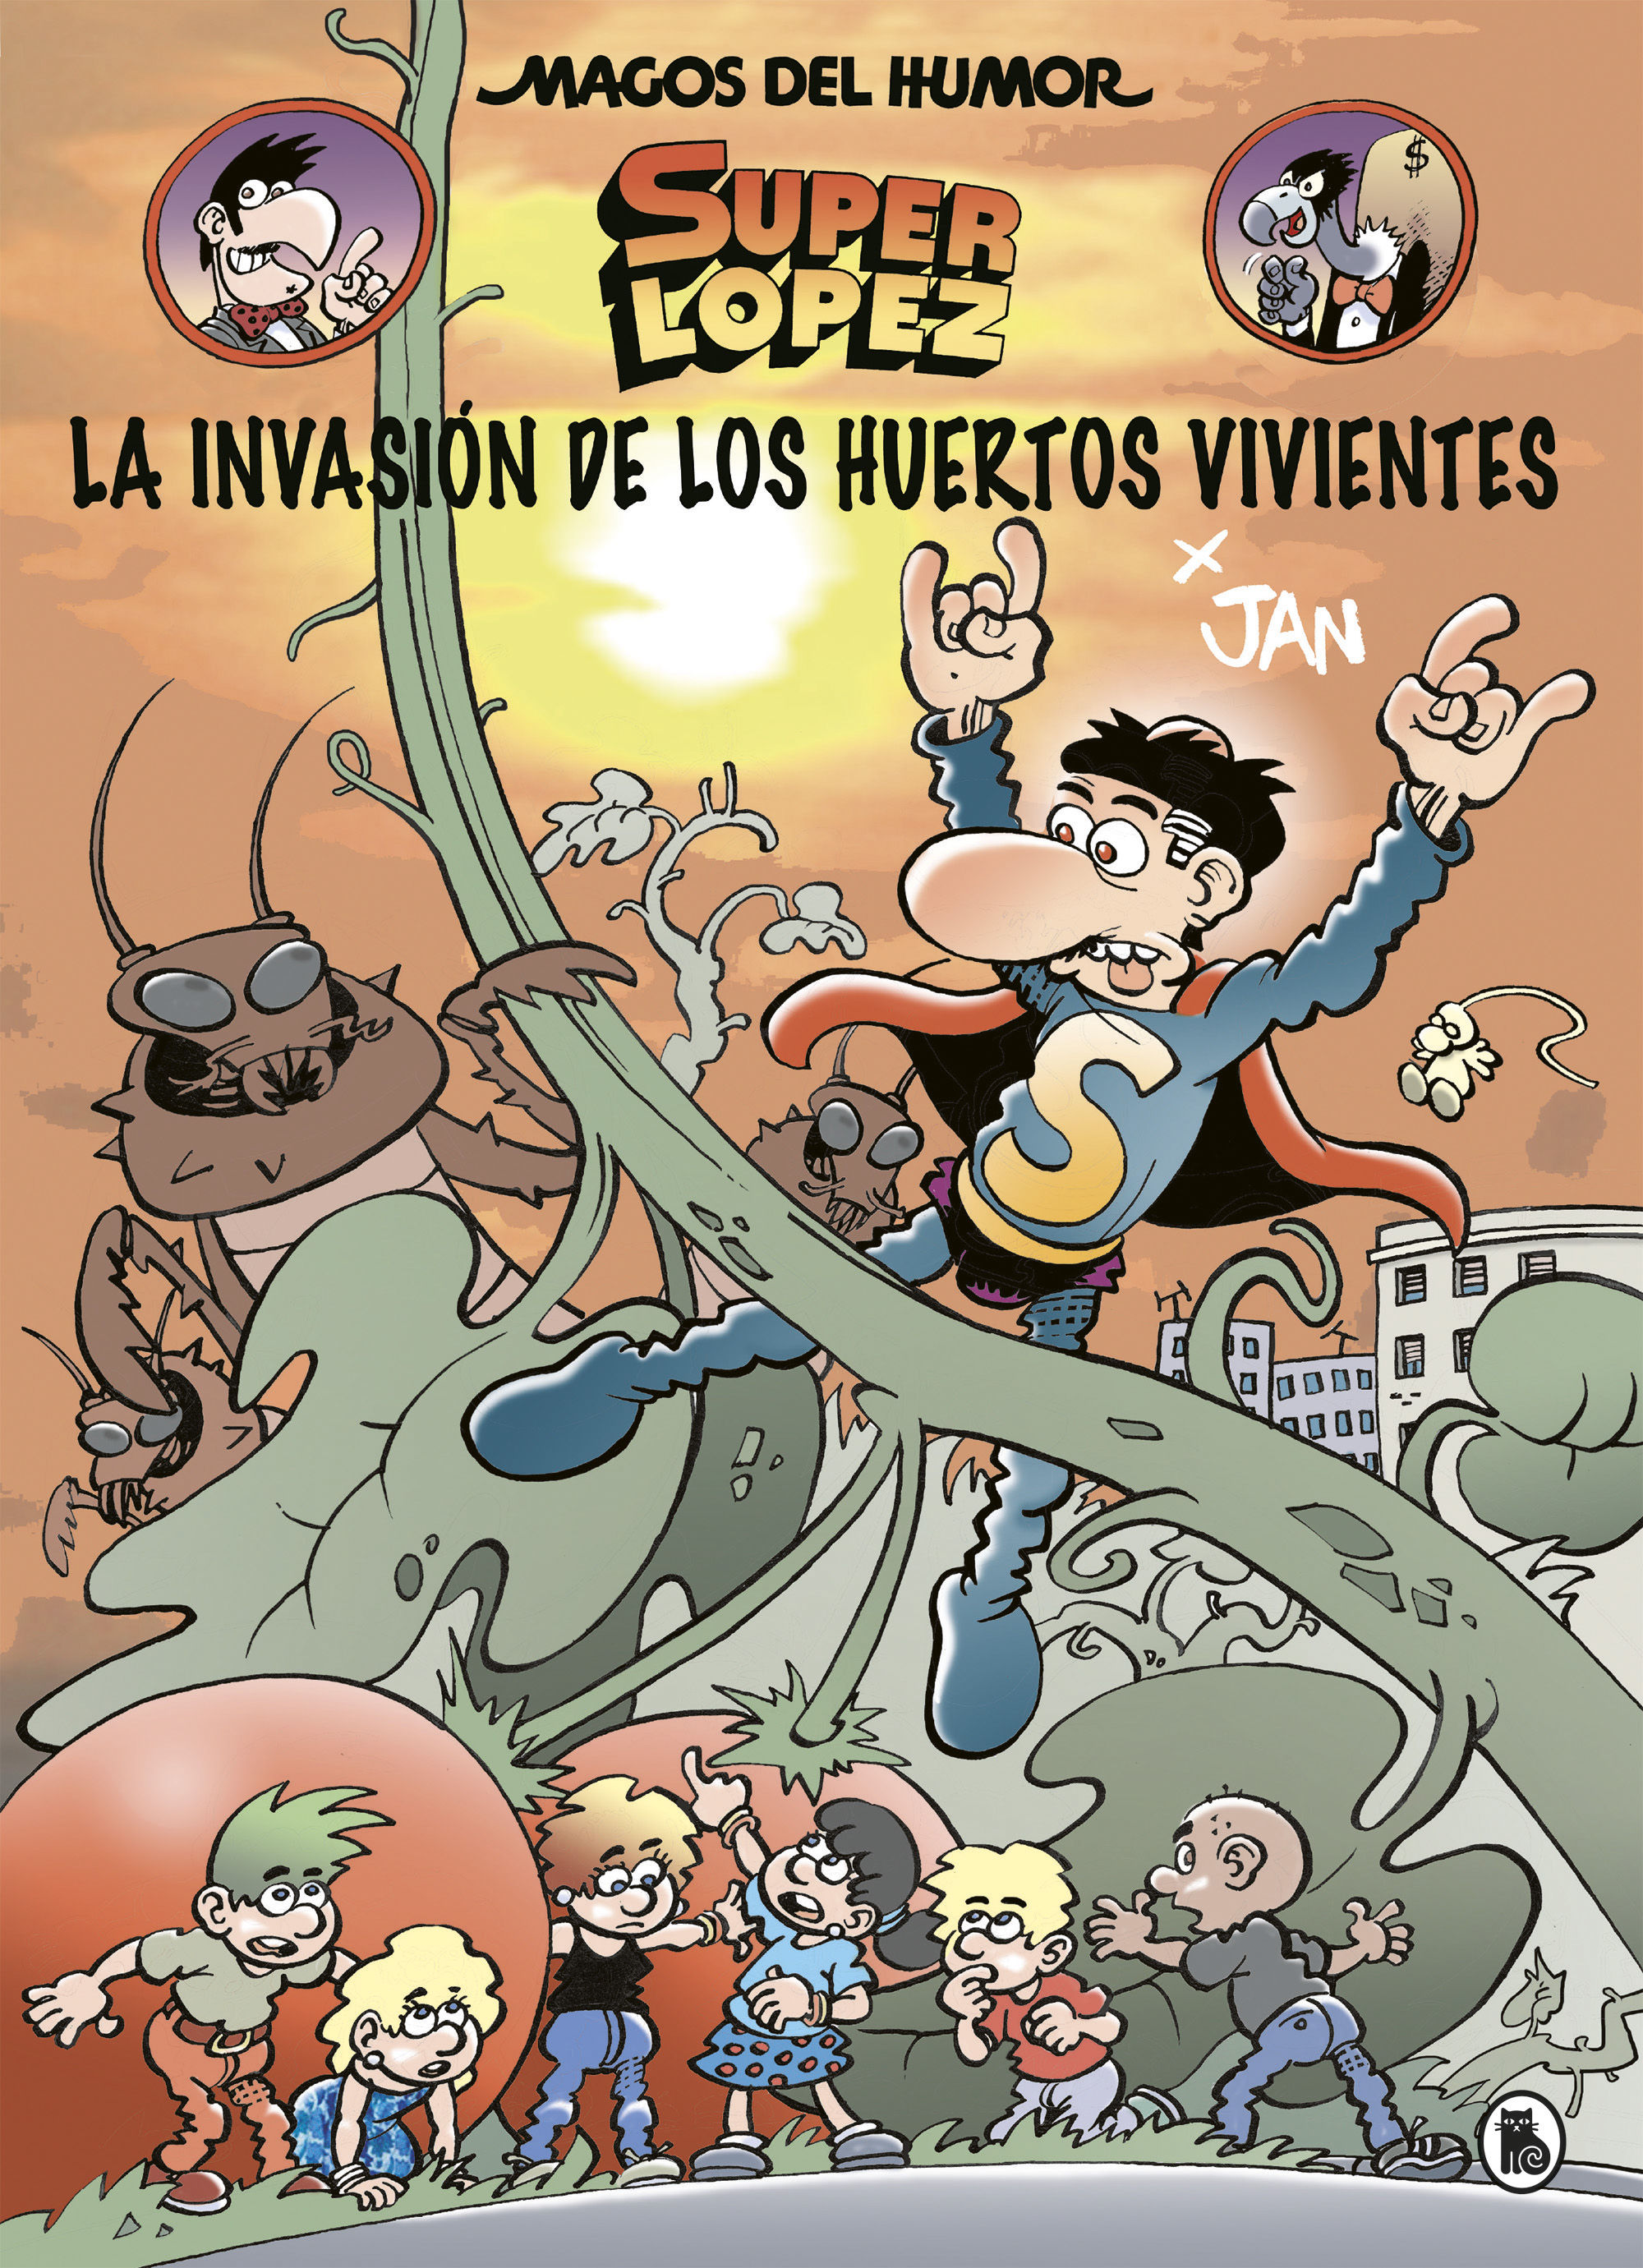 MAGOS DEL HUMOR SUPERLOPEZ 207.INVASION